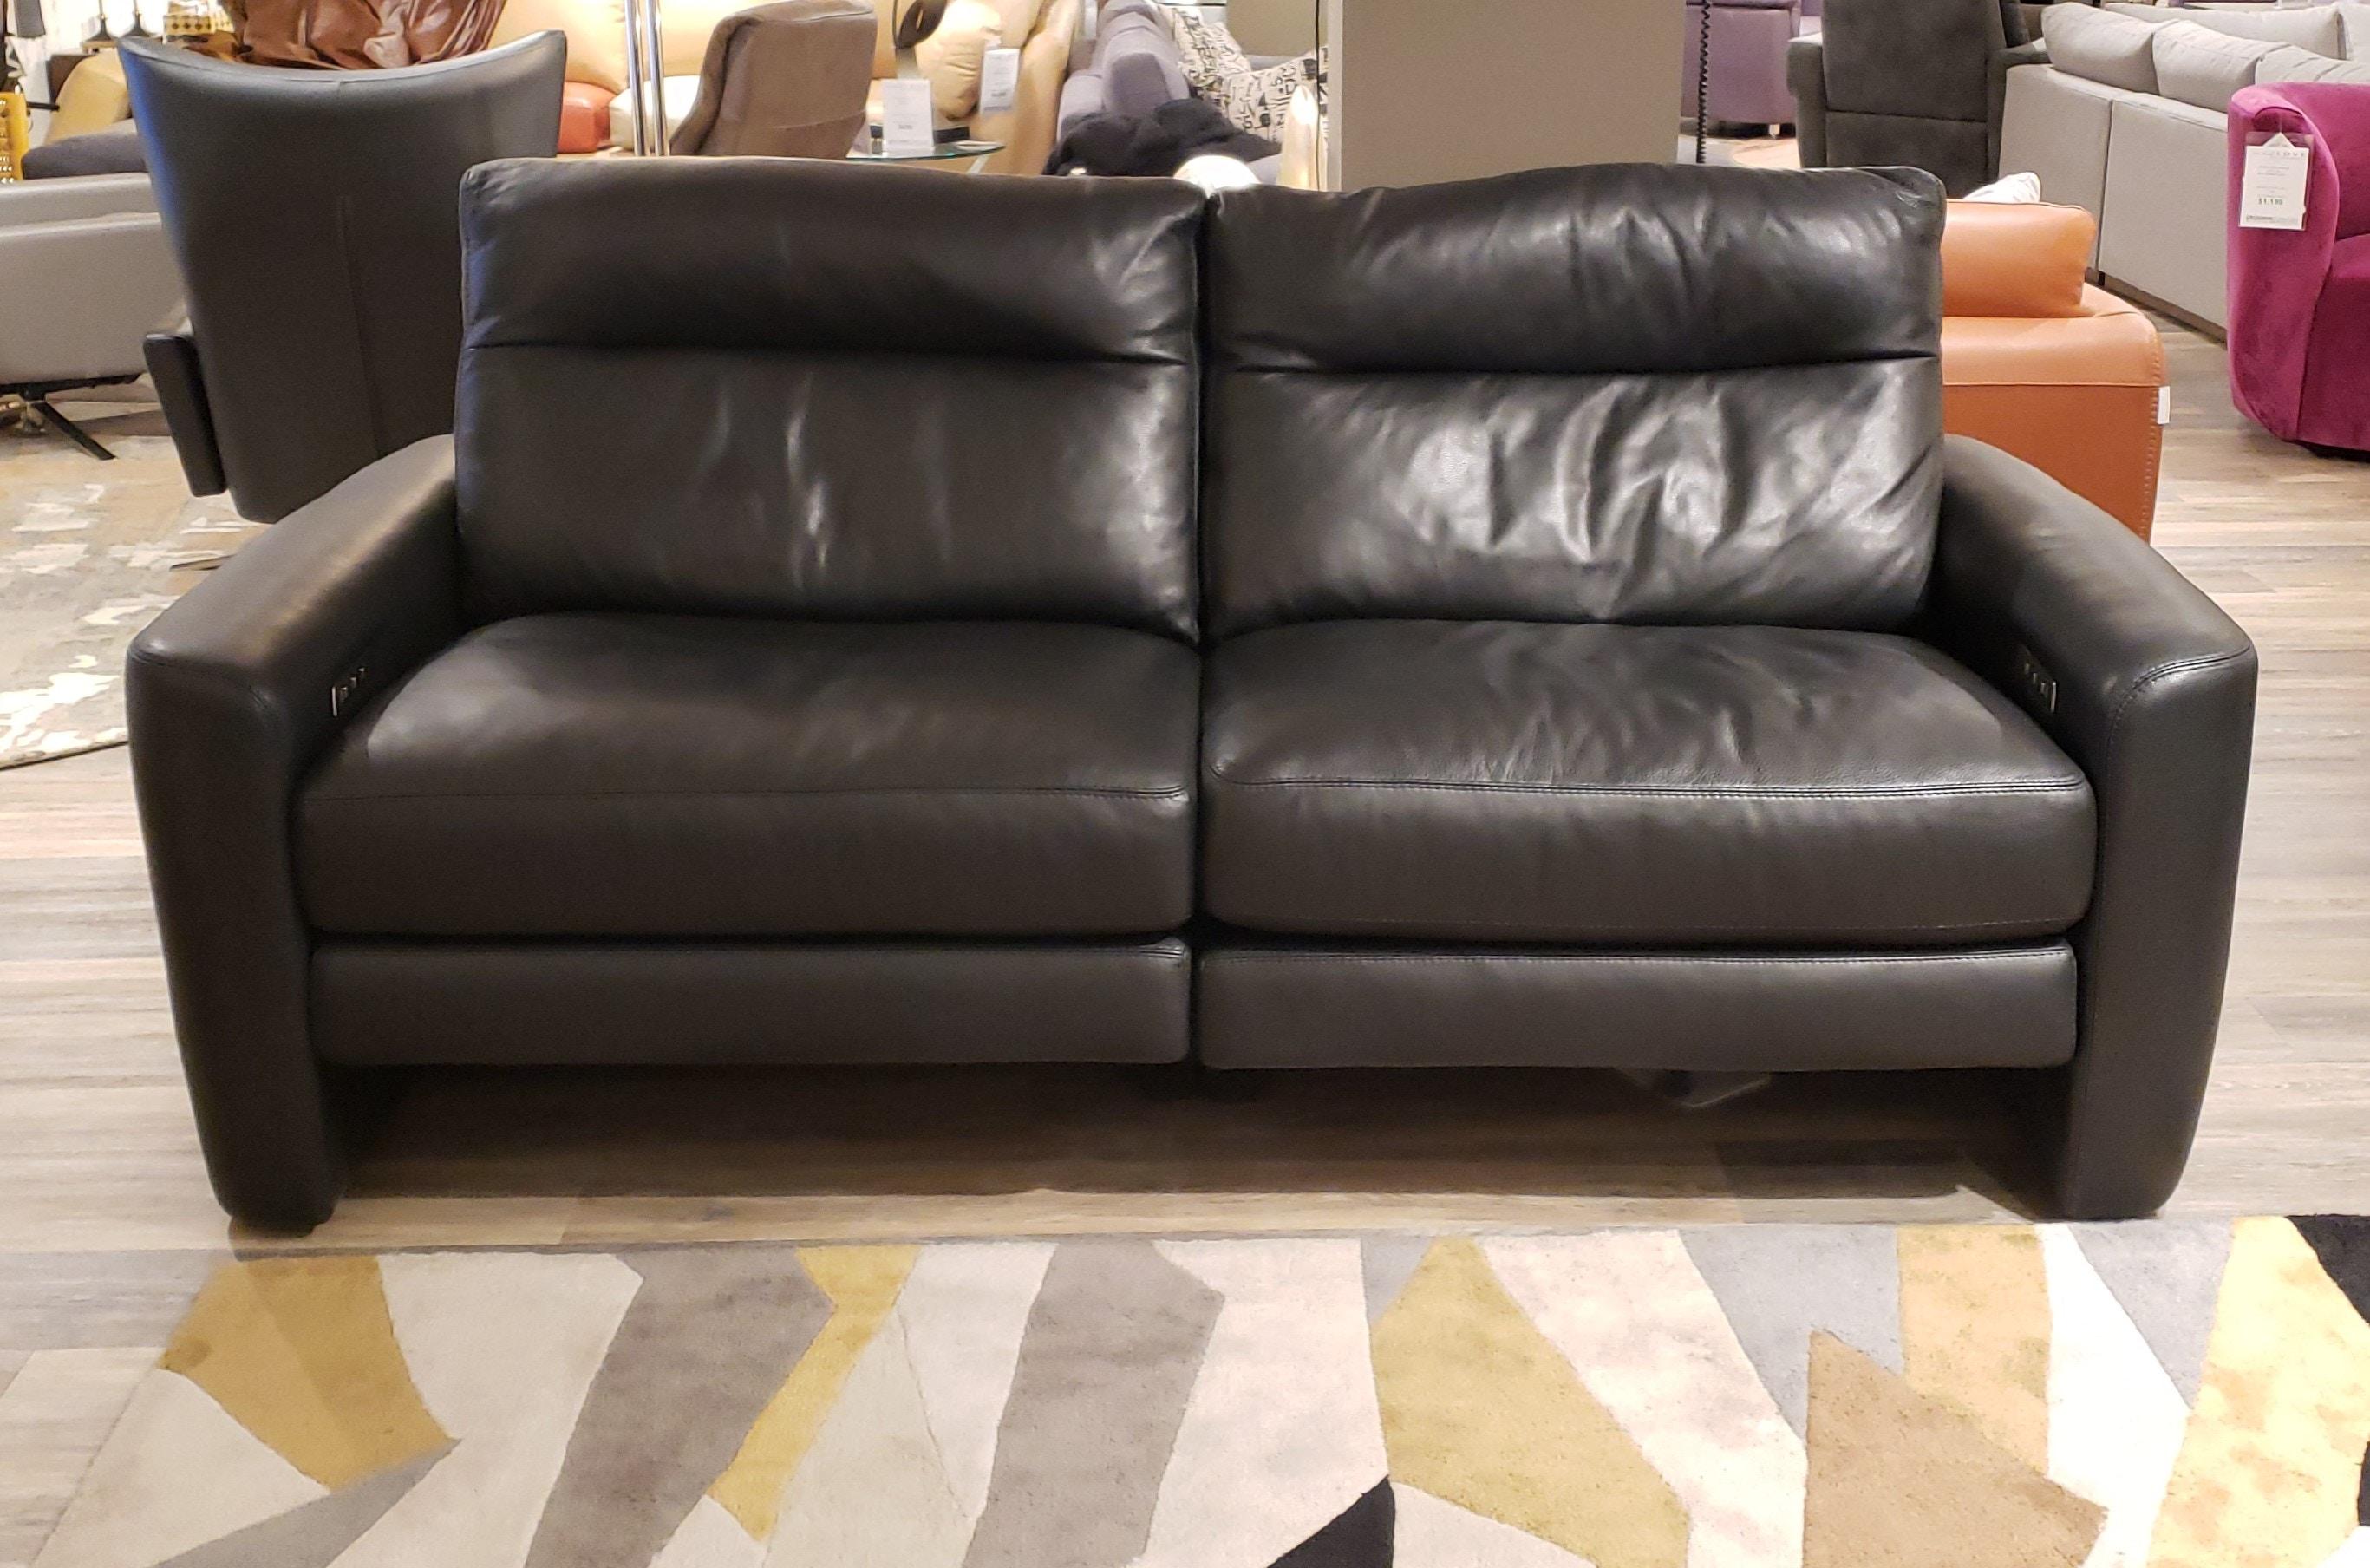 american leather furniture grossman furniture philadelphia pa rh grossmanfurniture com